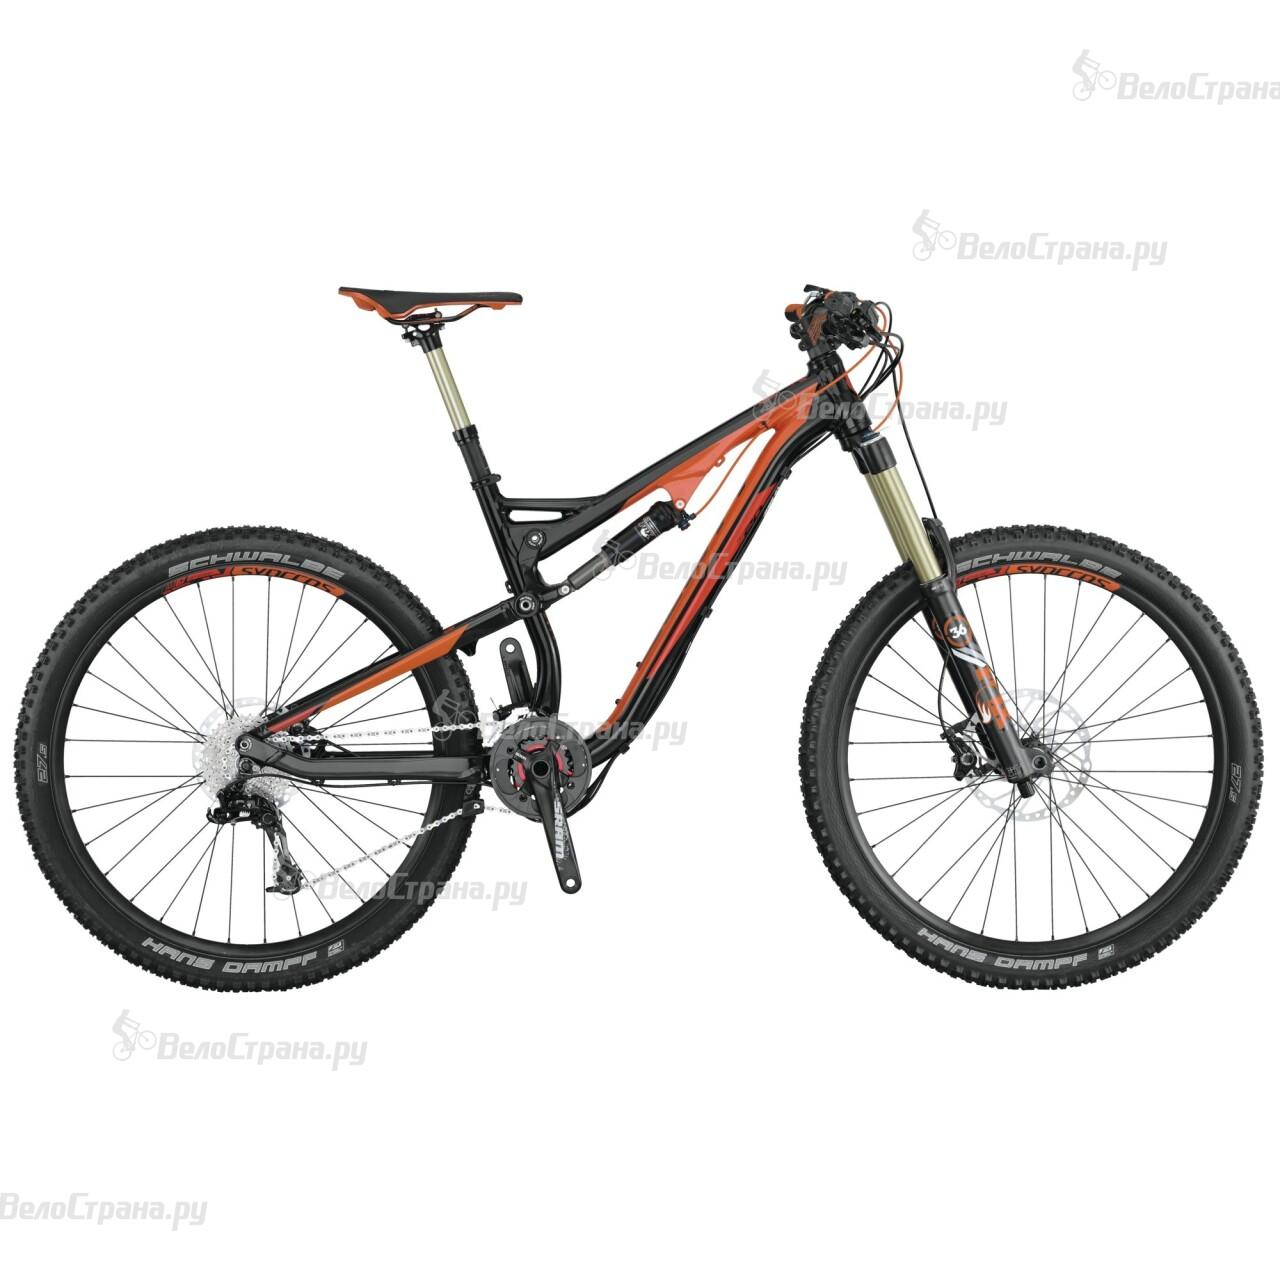 Велосипед Scott Genius LT 720 (2015) велосипед scott genius lt 720 2015